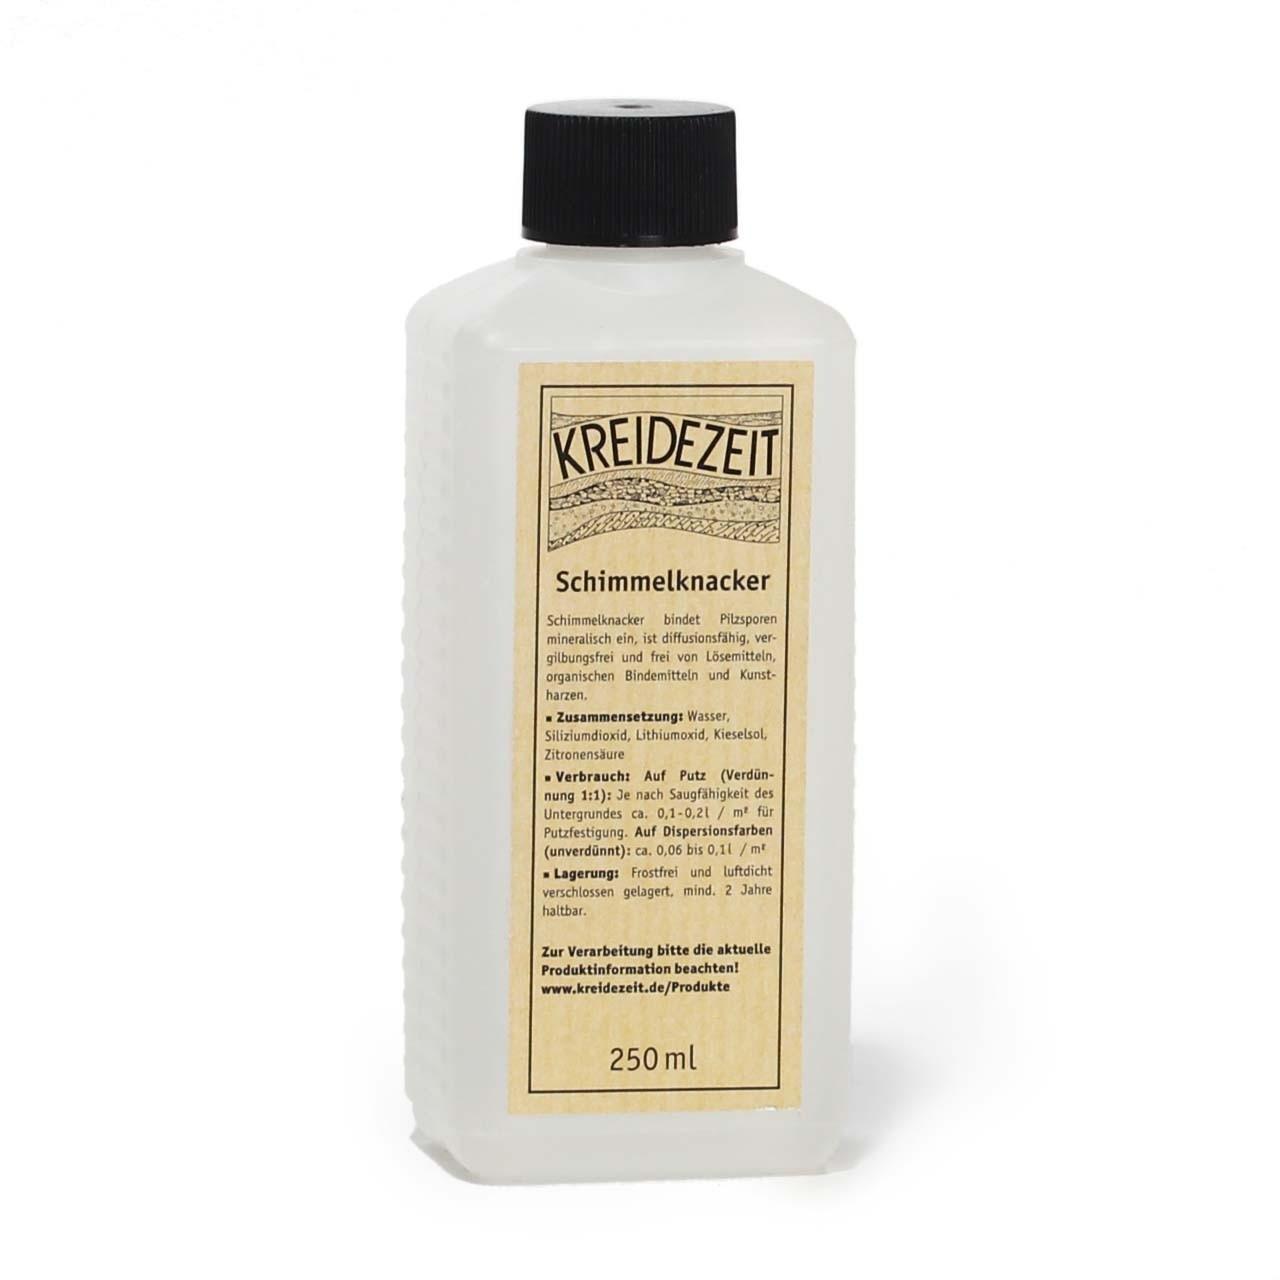 Kreidezeit Schimmelknacker 250 ml